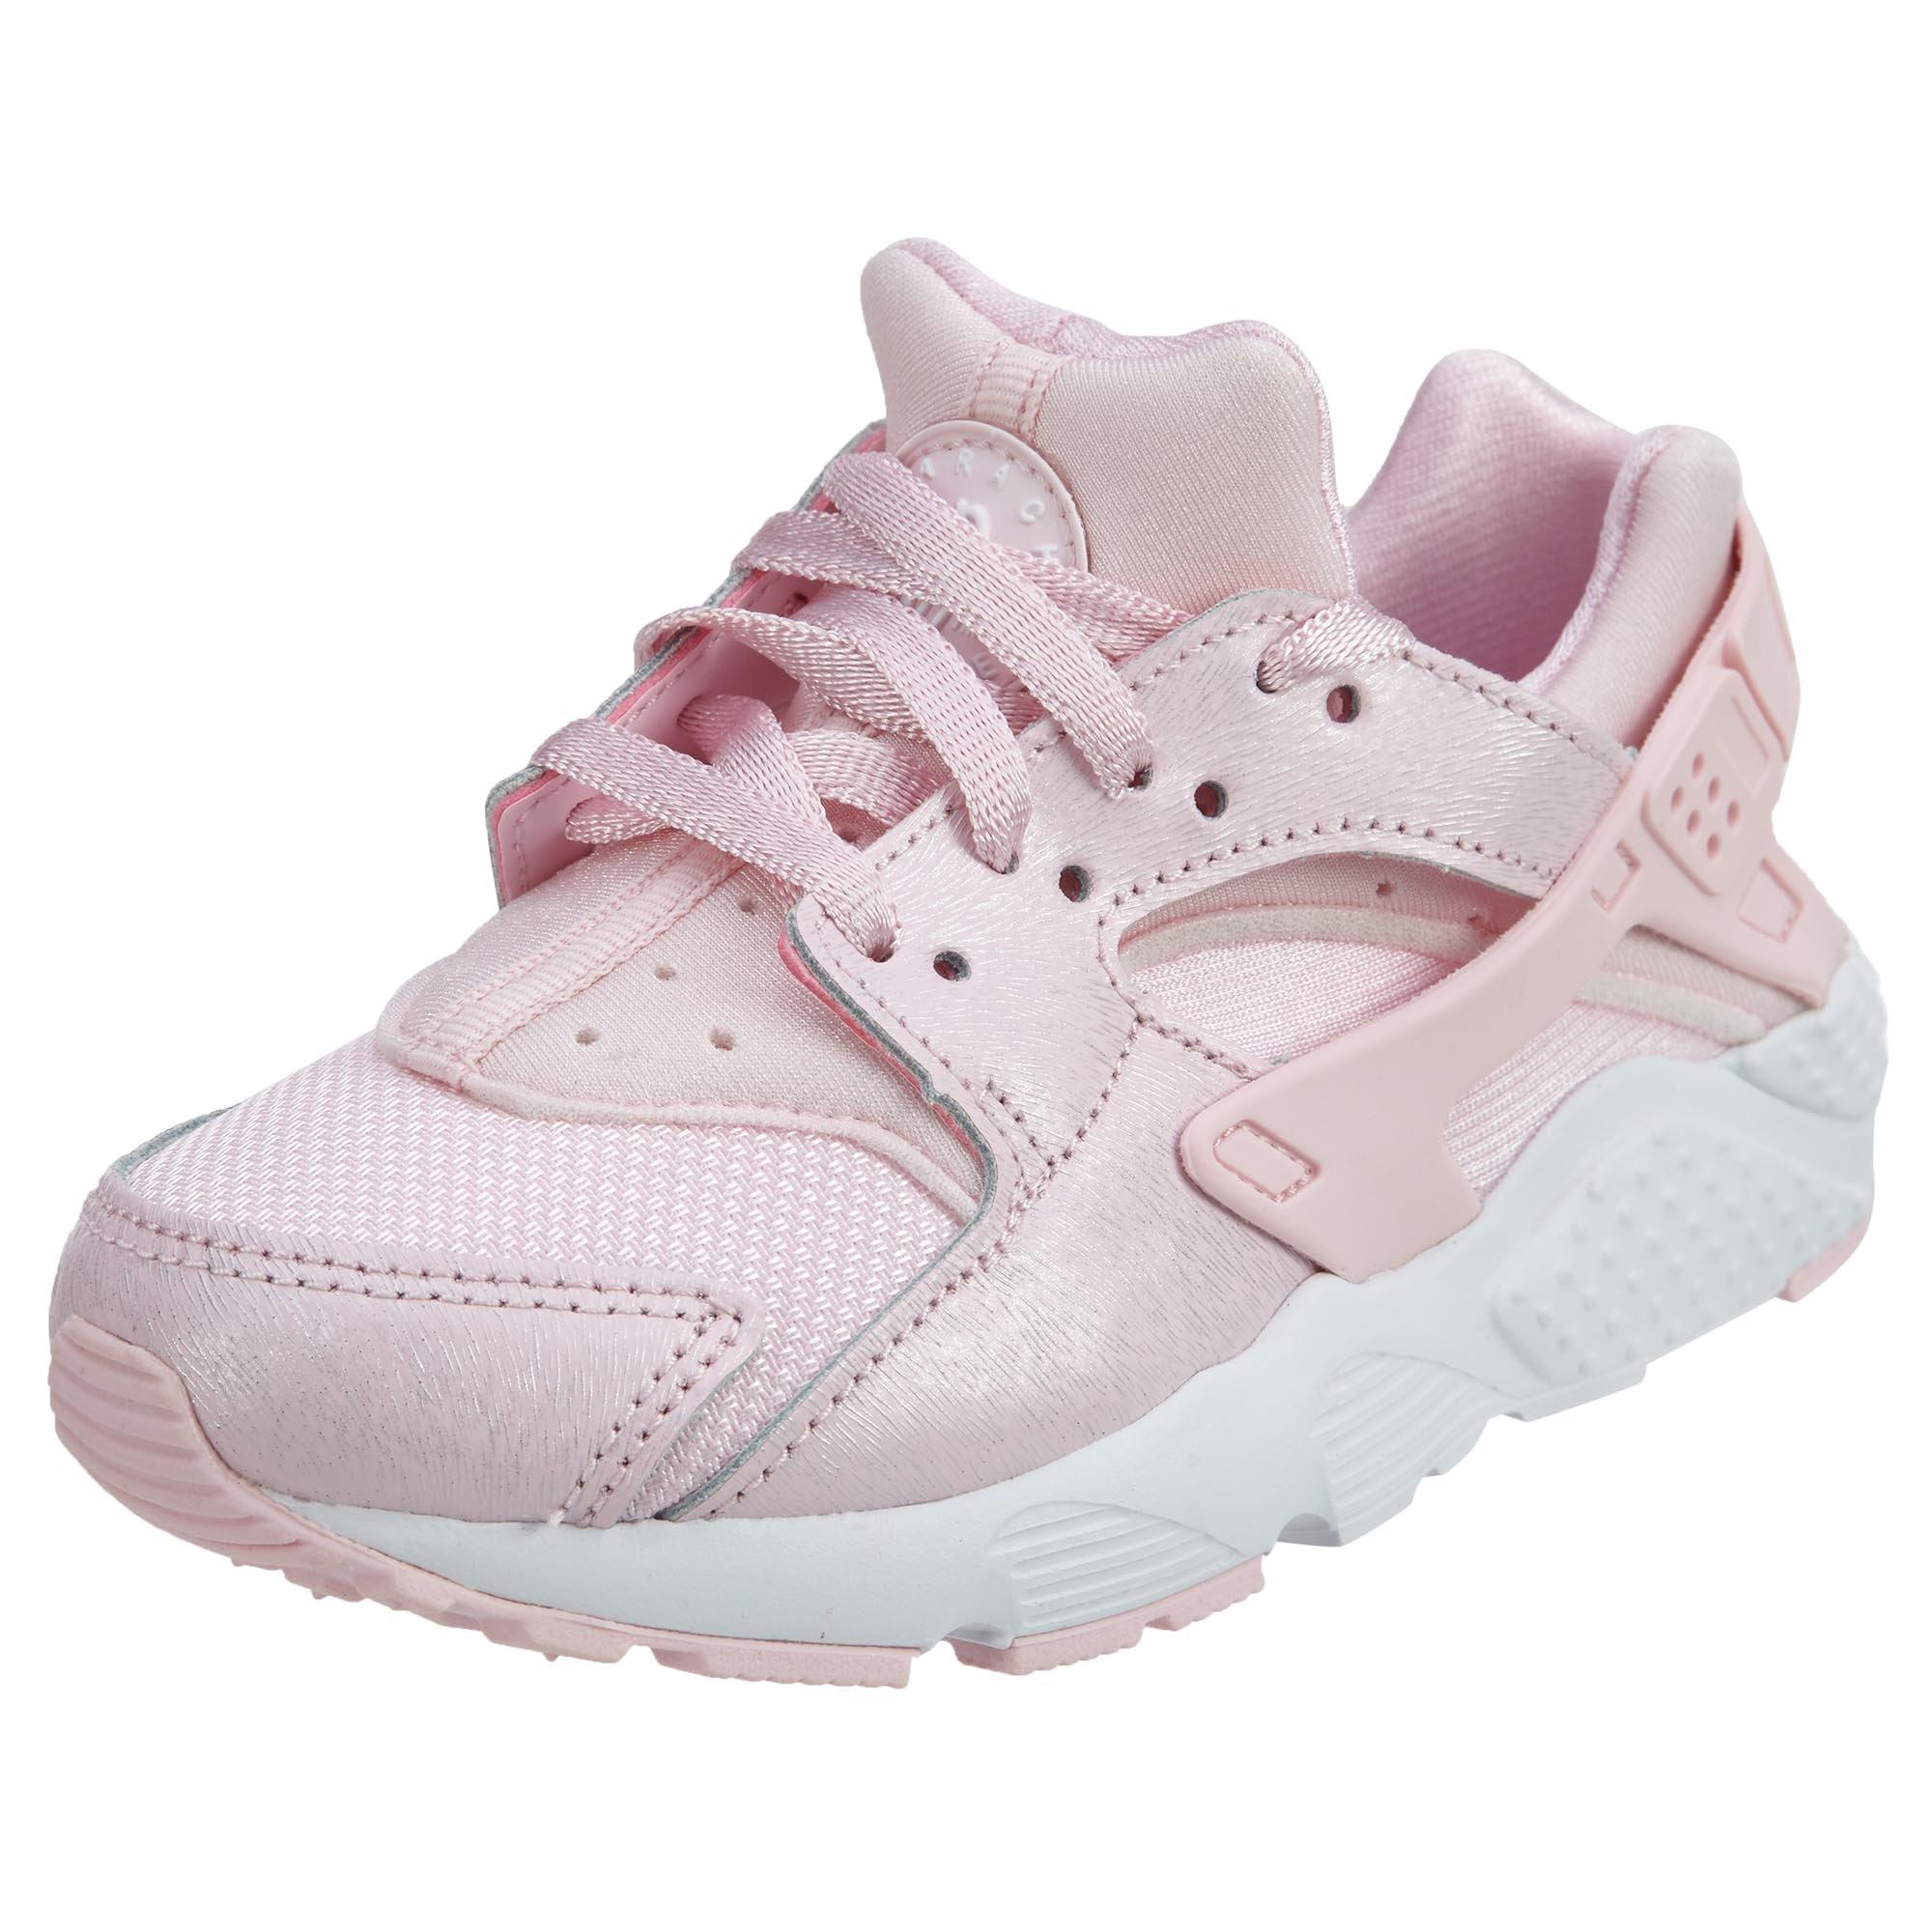 Best Deals Girls Nike Shoes Size 3 Super fers